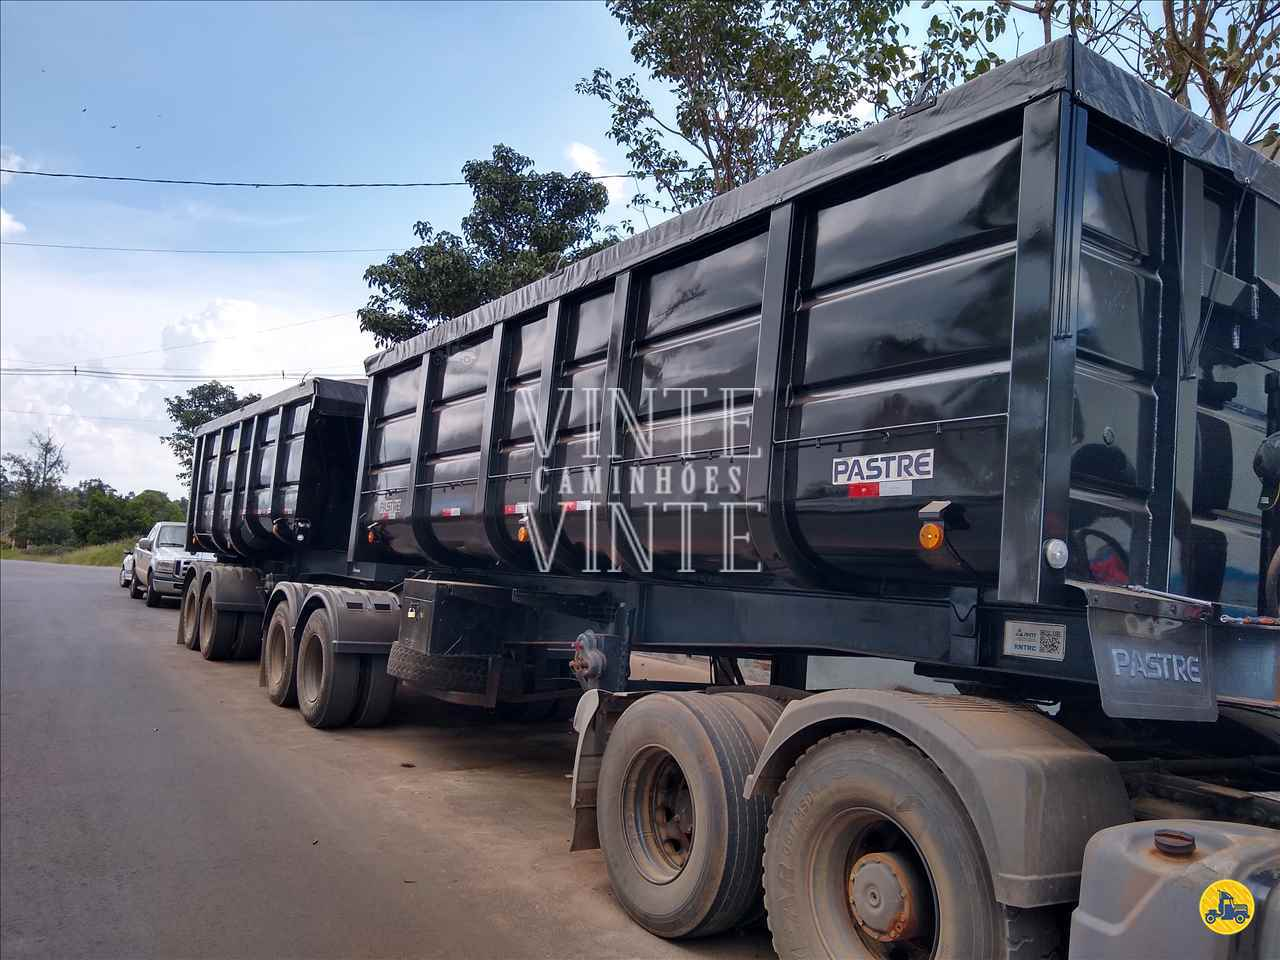 BASCULANTE de Vinte-Vinte Caminhões - SANTO ANDRE/SP